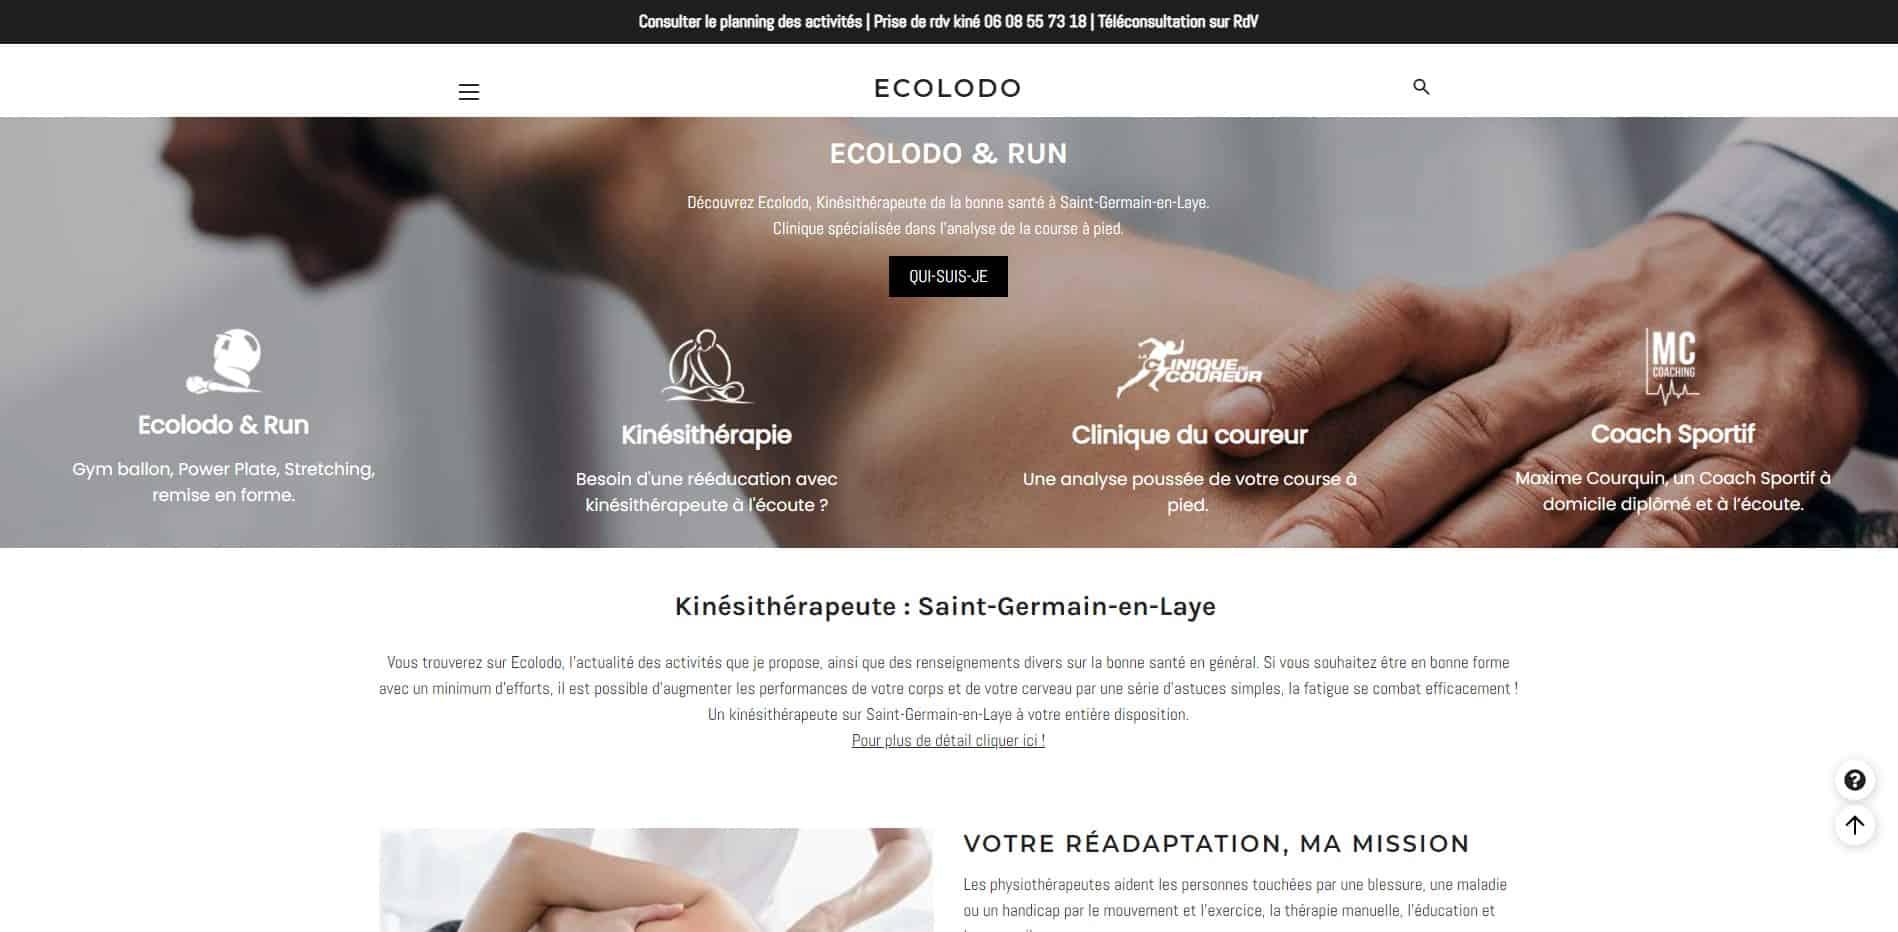 Site Vitrine - Shopify